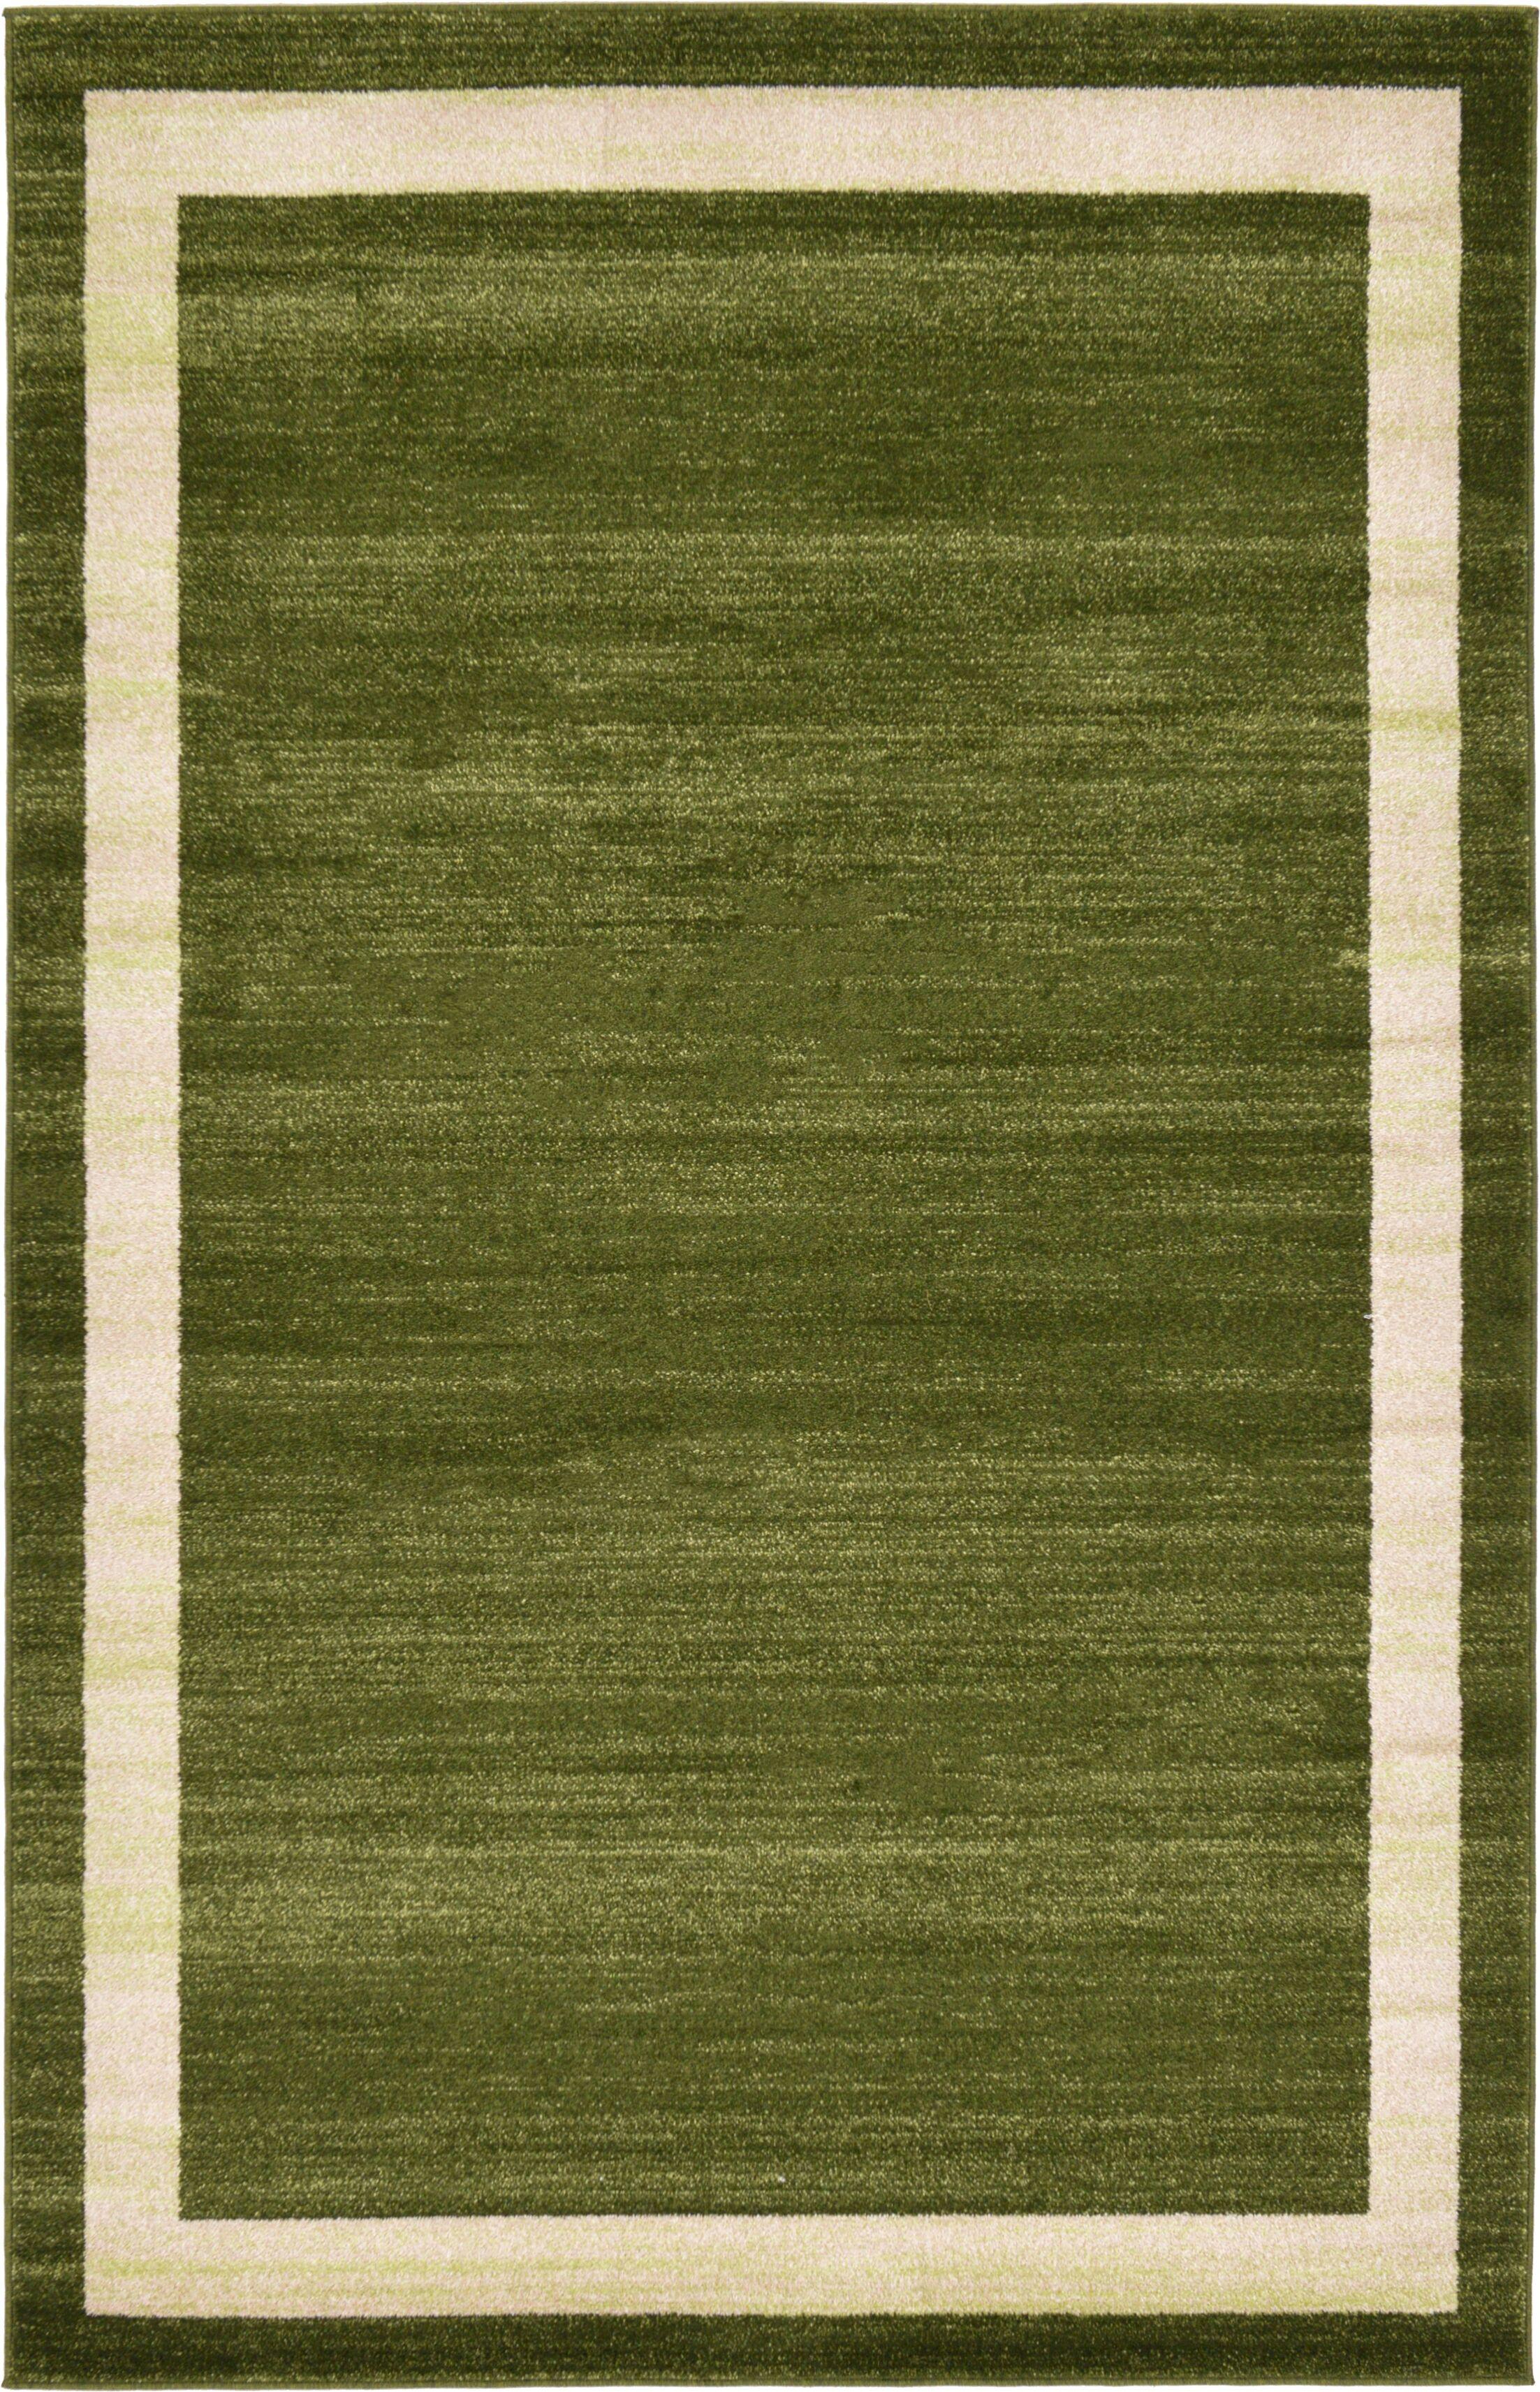 Christi Green/Beige Area Rug Rug Size: Rectangle 5' x 8'